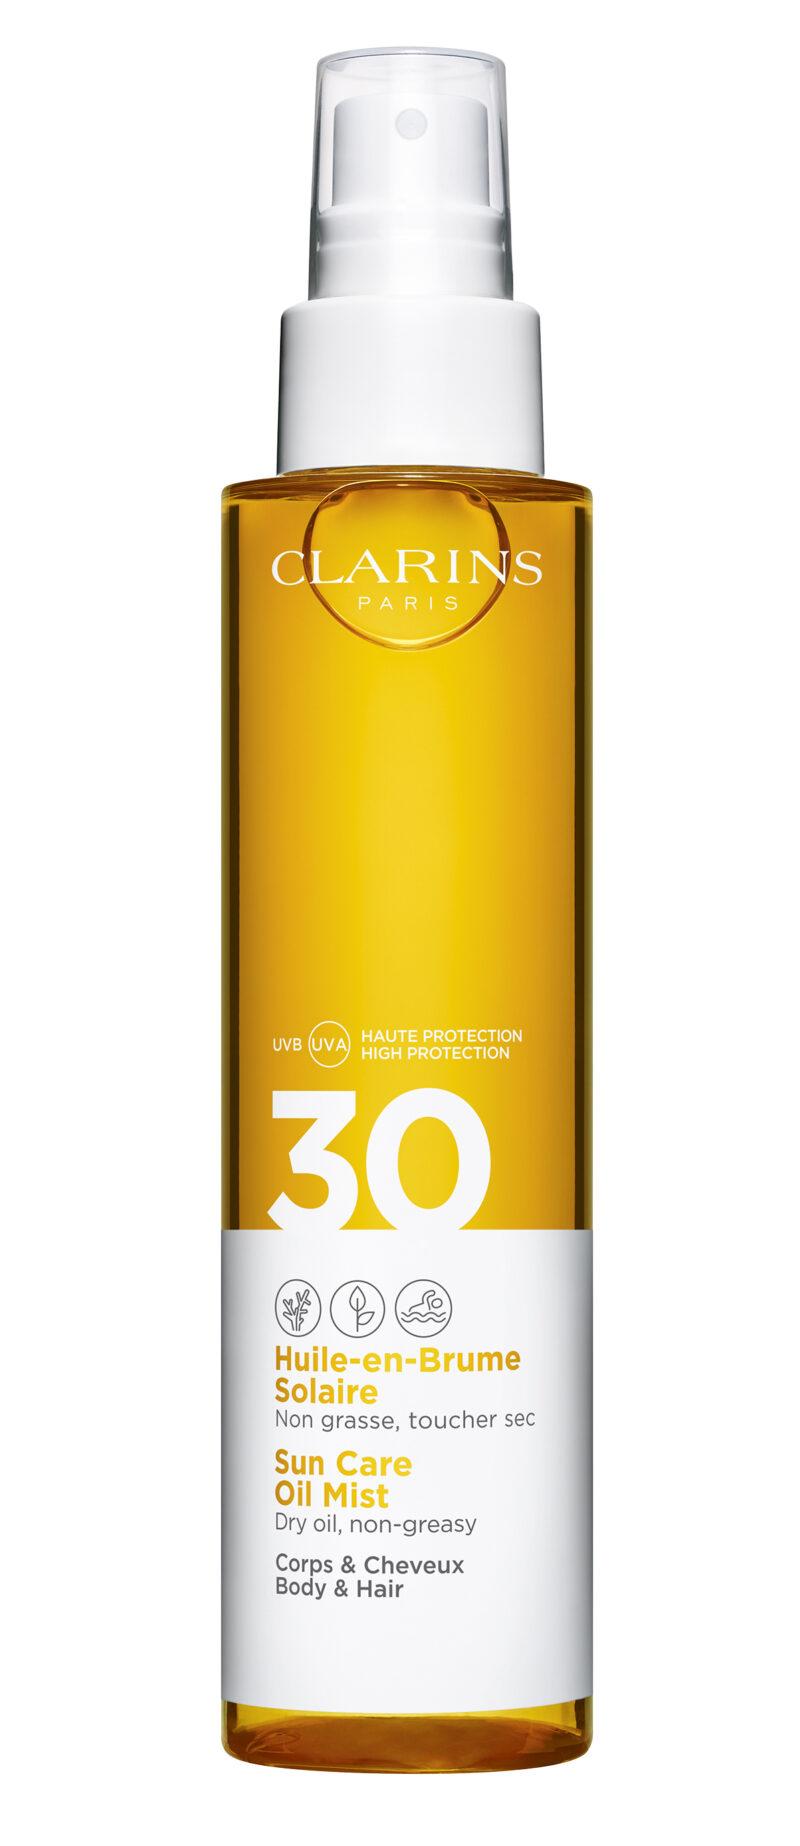 Clarins sun care oil mist spf 30.